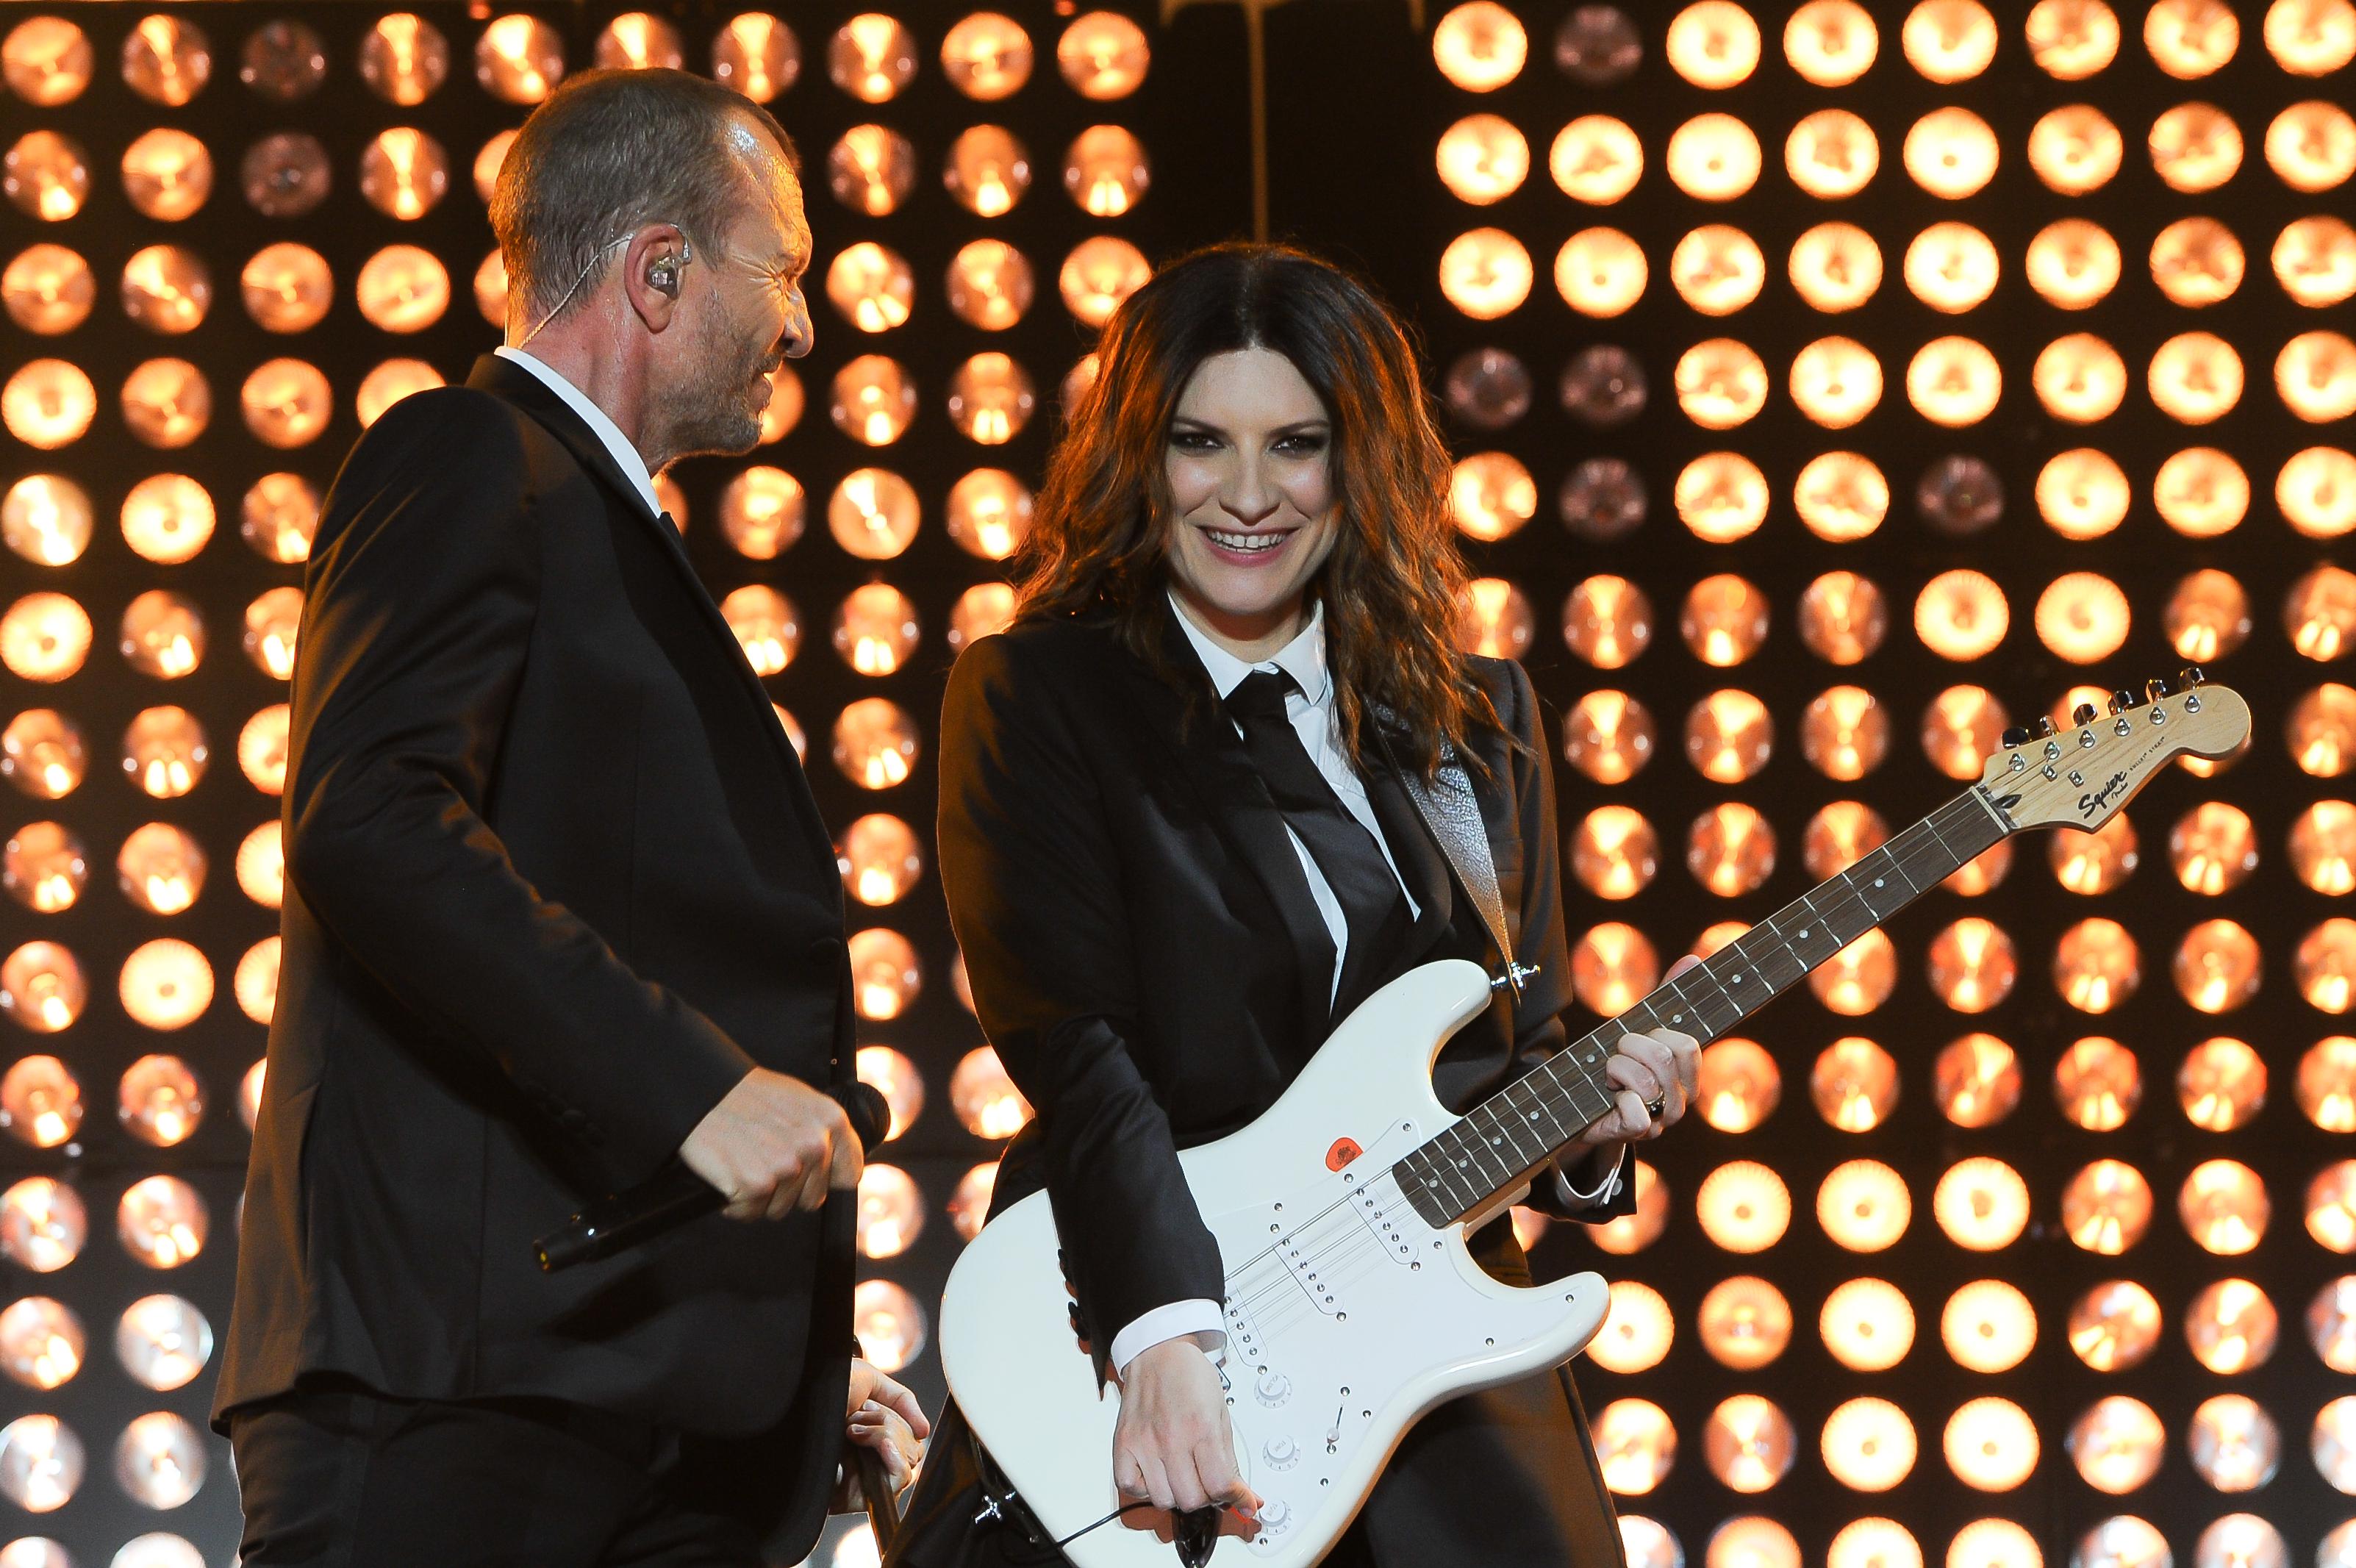 Laura Pausini y Biagio Antonacci concierto en Roma